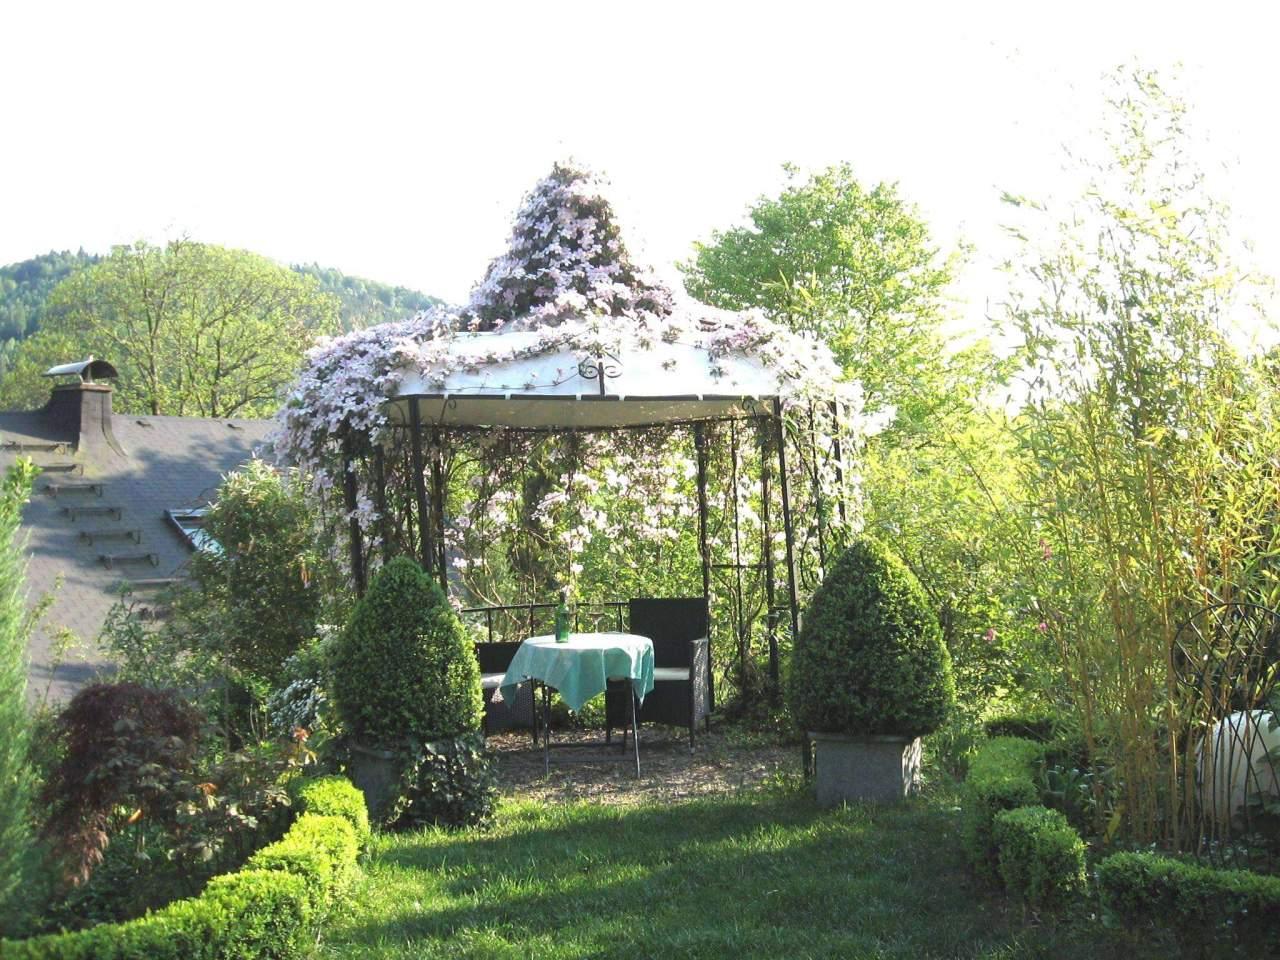 garten idee inspirierend landscaping ideas around trees procura home blog of garten idee